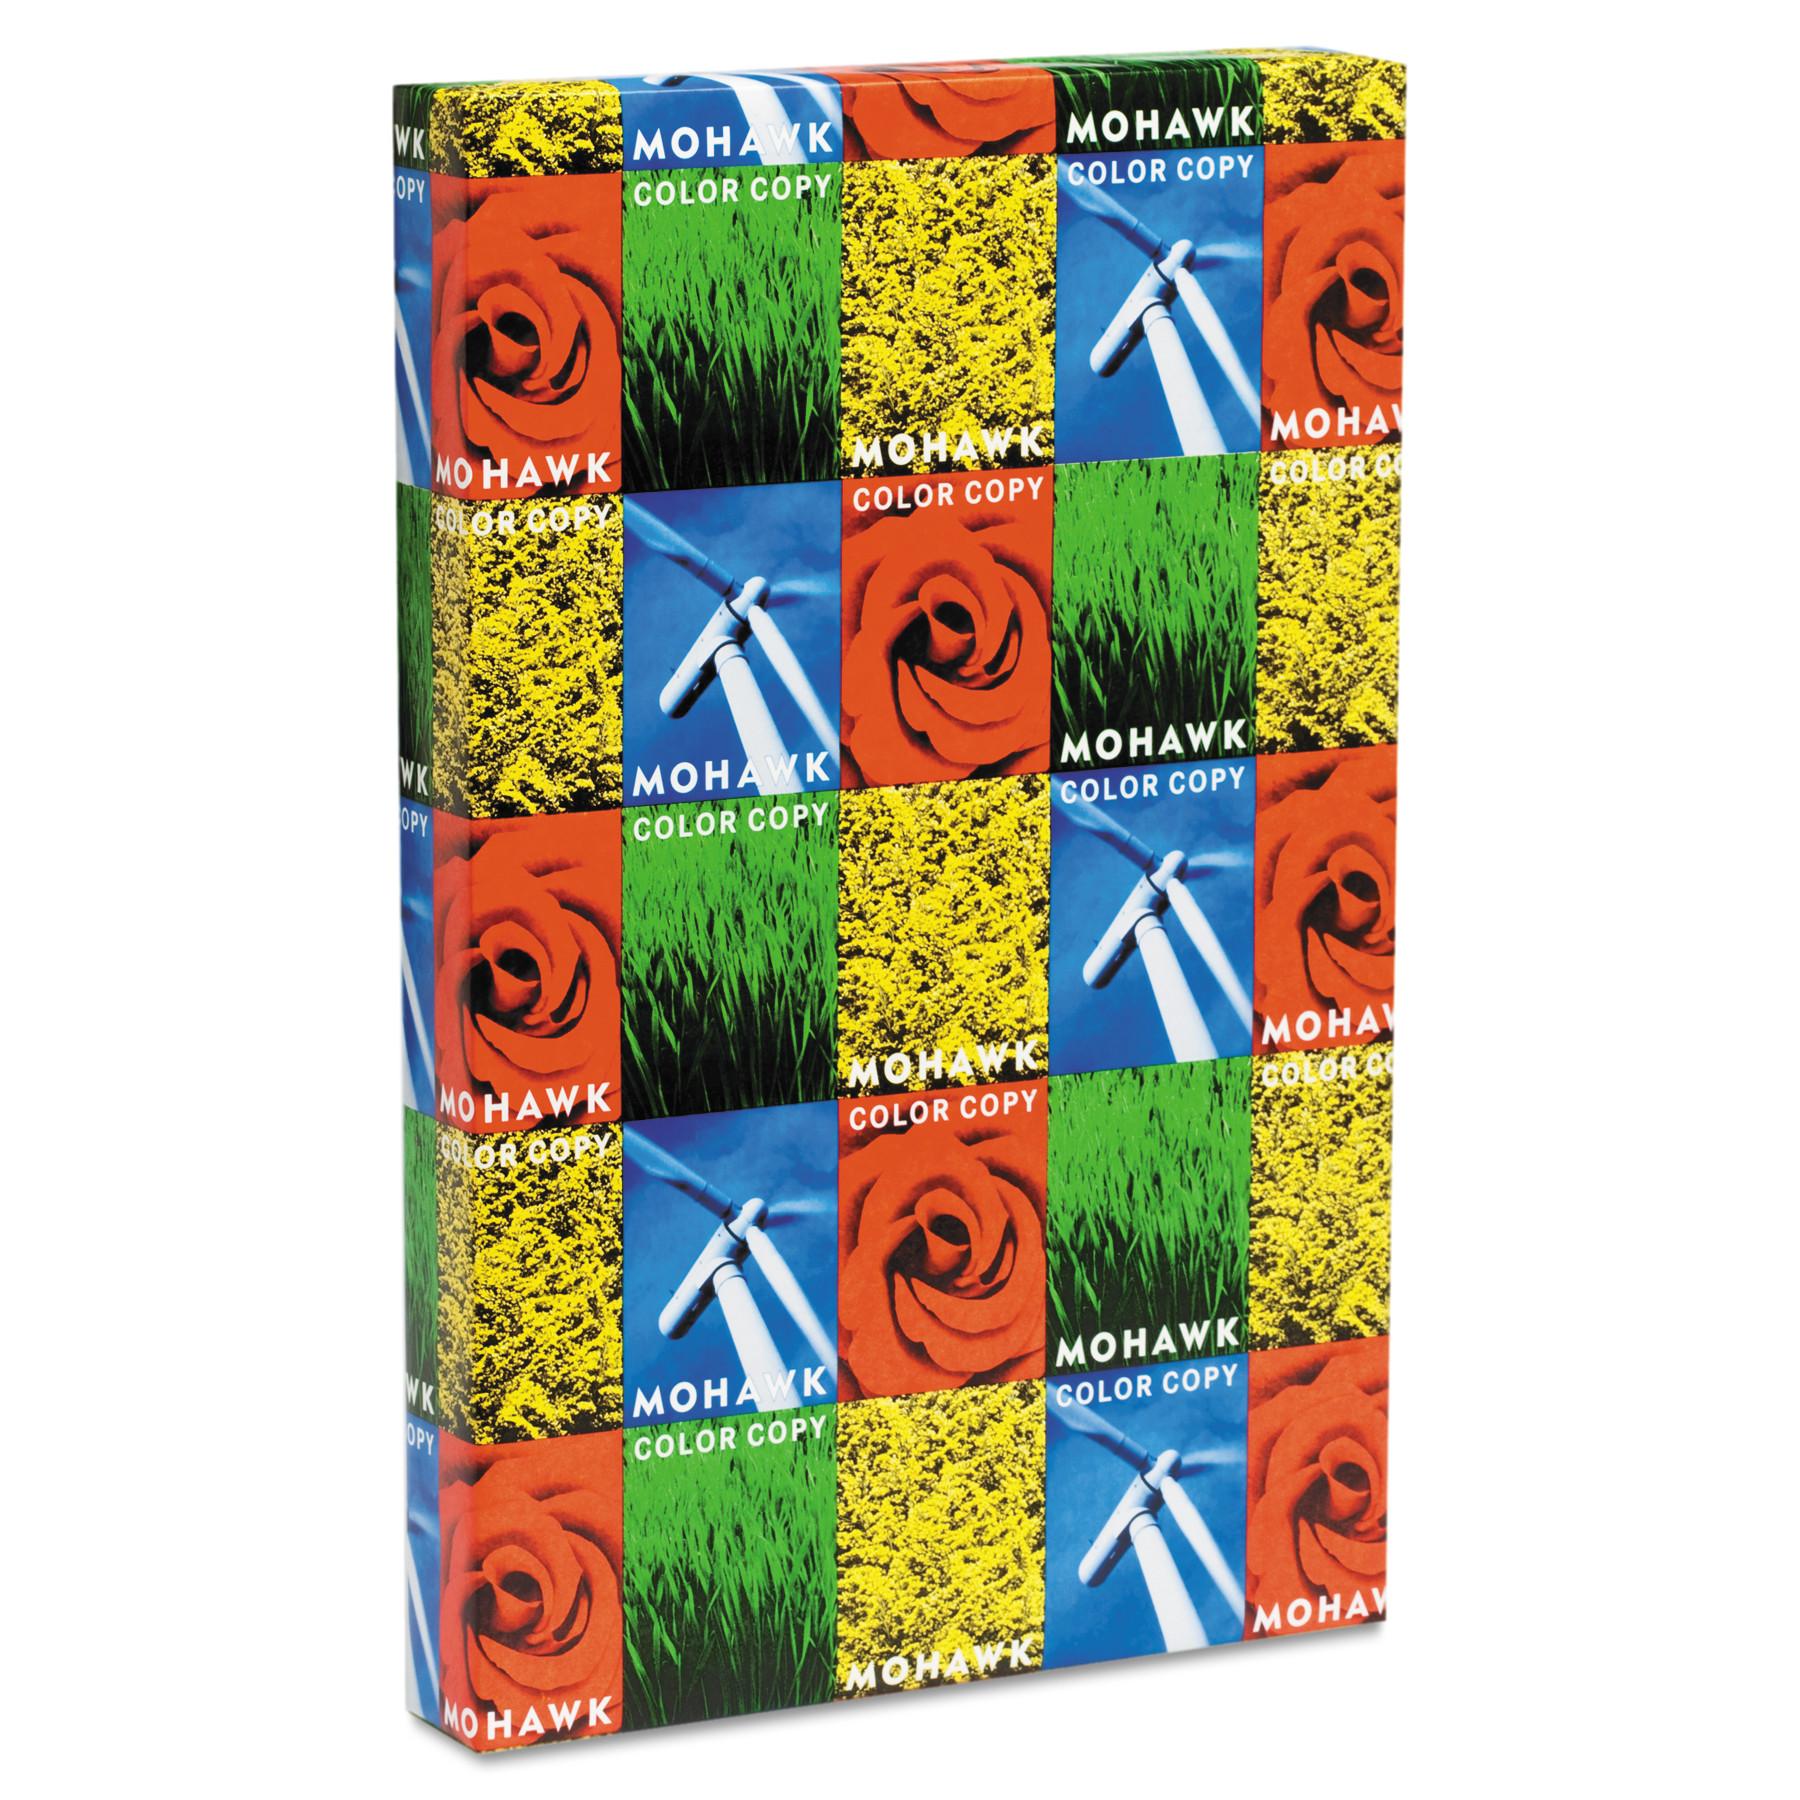 Mohawk Copier Gloss Paper, 94 Brightness, 40lb, 17 x 11, Pure White, 500 Sheets -MOW36205